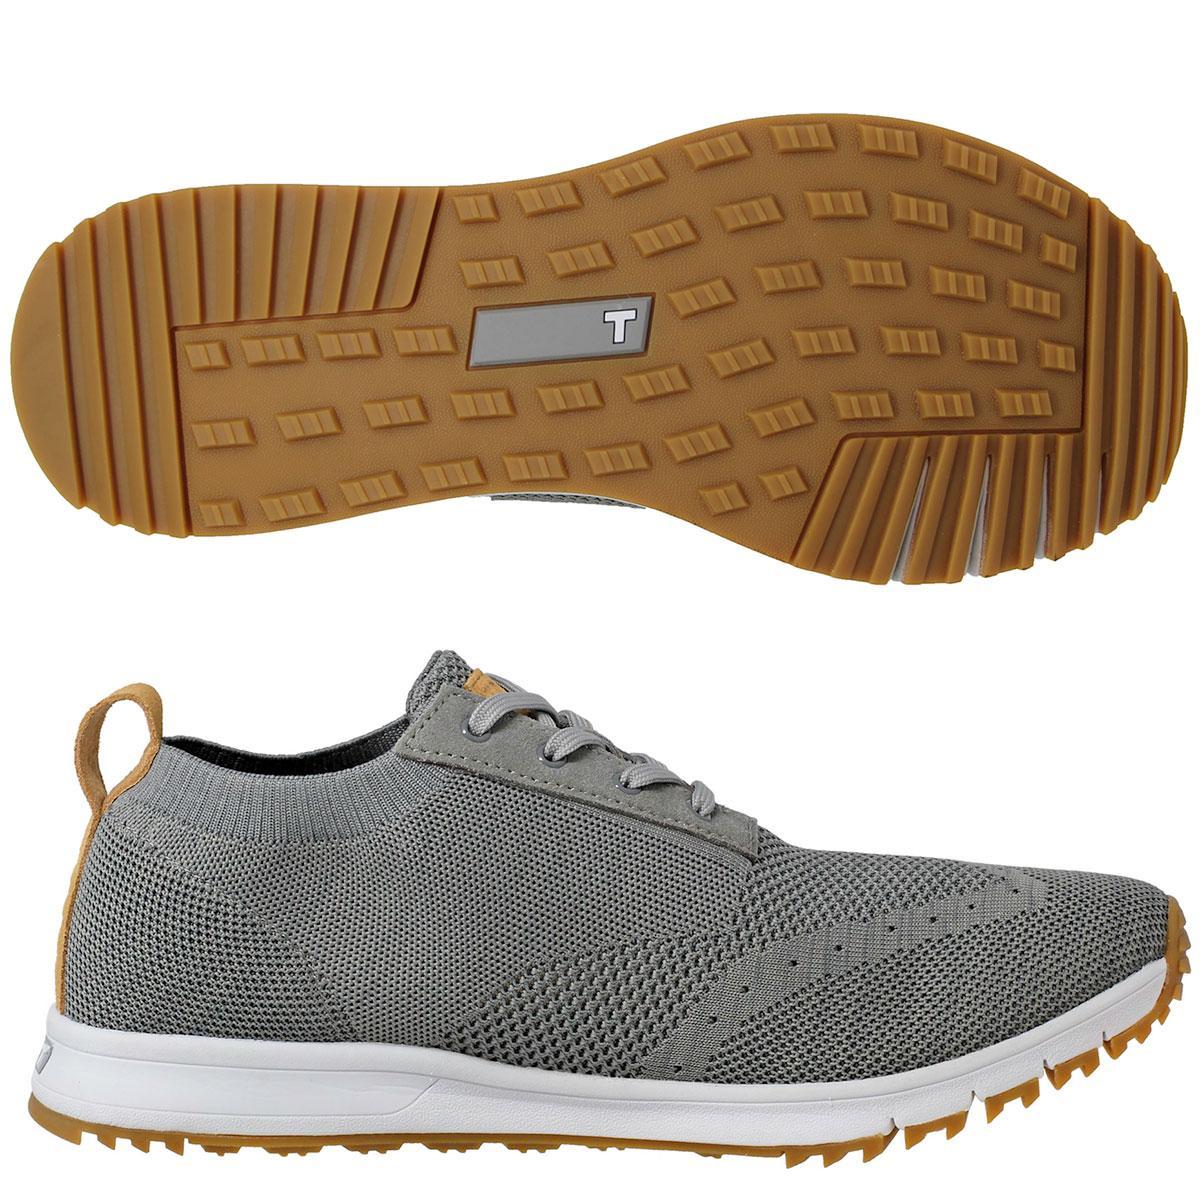 TRUE linkswear トゥルーリンクスウェア GENT KNIT シューズ [ゴルフ シューズ 靴 ゴルフシューズ メンズ 即納 あす楽]